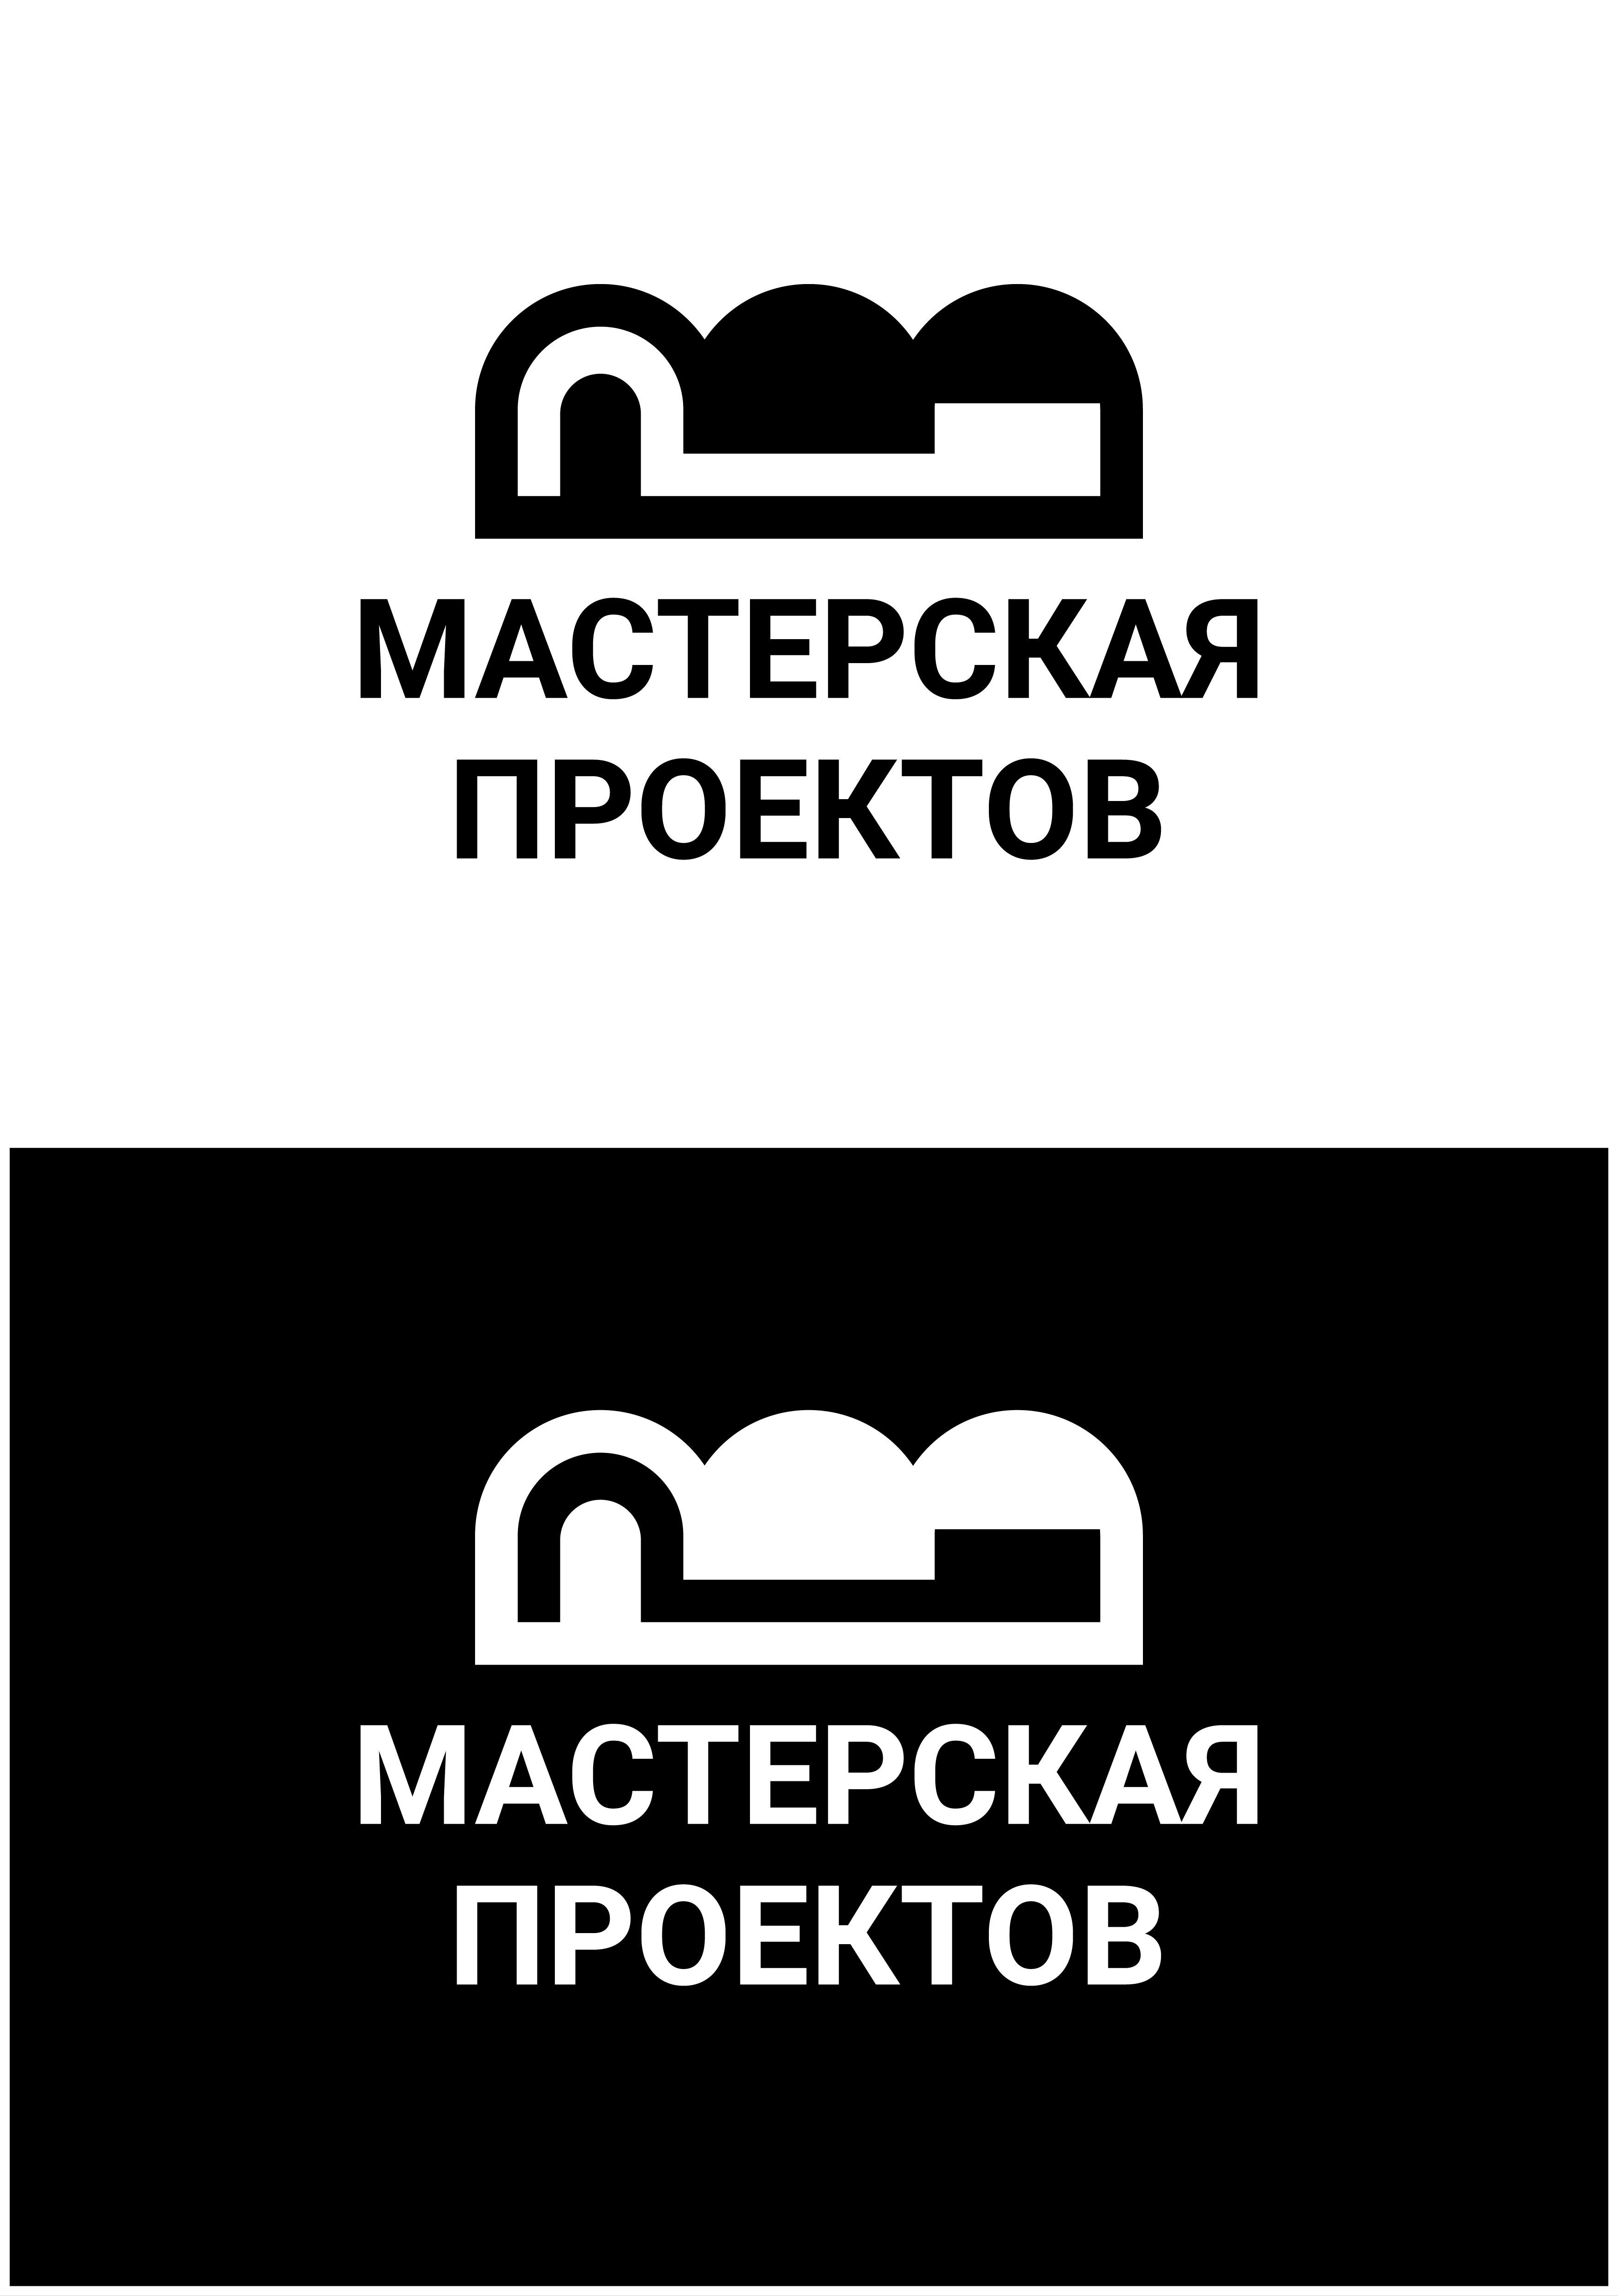 Разработка логотипа строительно-мебельного проекта (см. опис фото f_622606e1e137dfa8.jpg